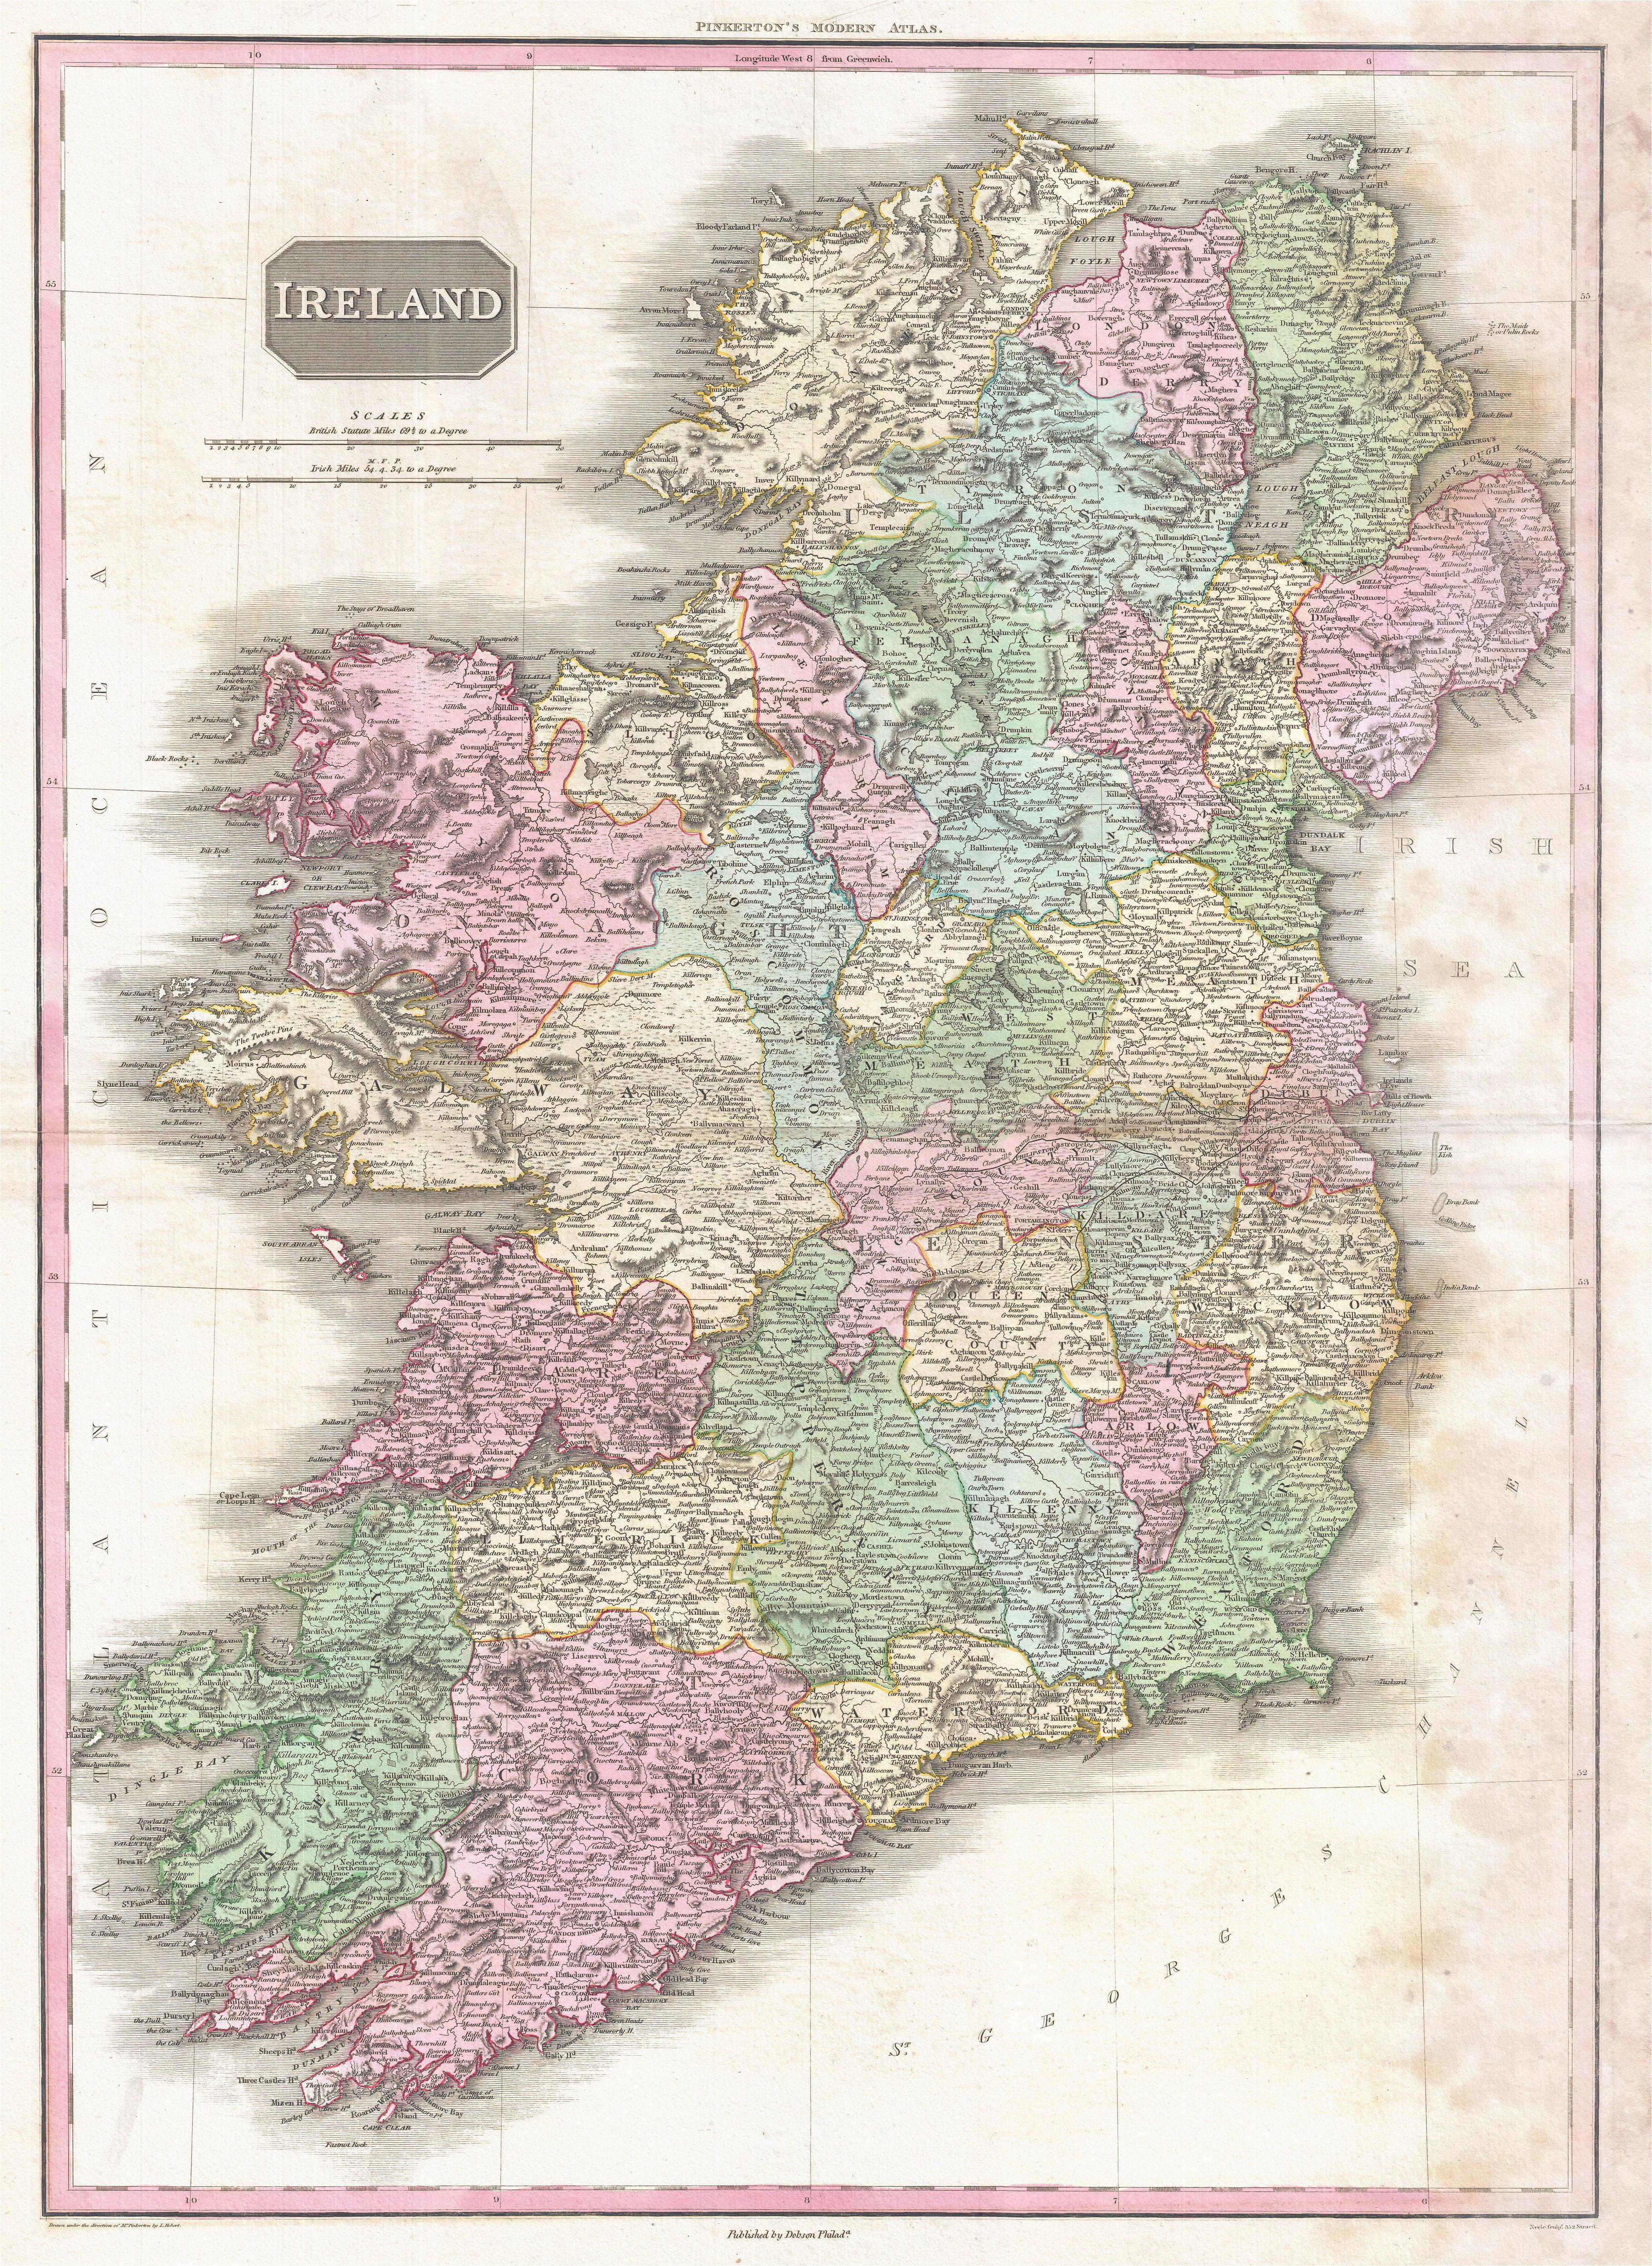 Historical Maps Ireland File 1818 Pinkerton Map Of Ireland Geographicus Ireland